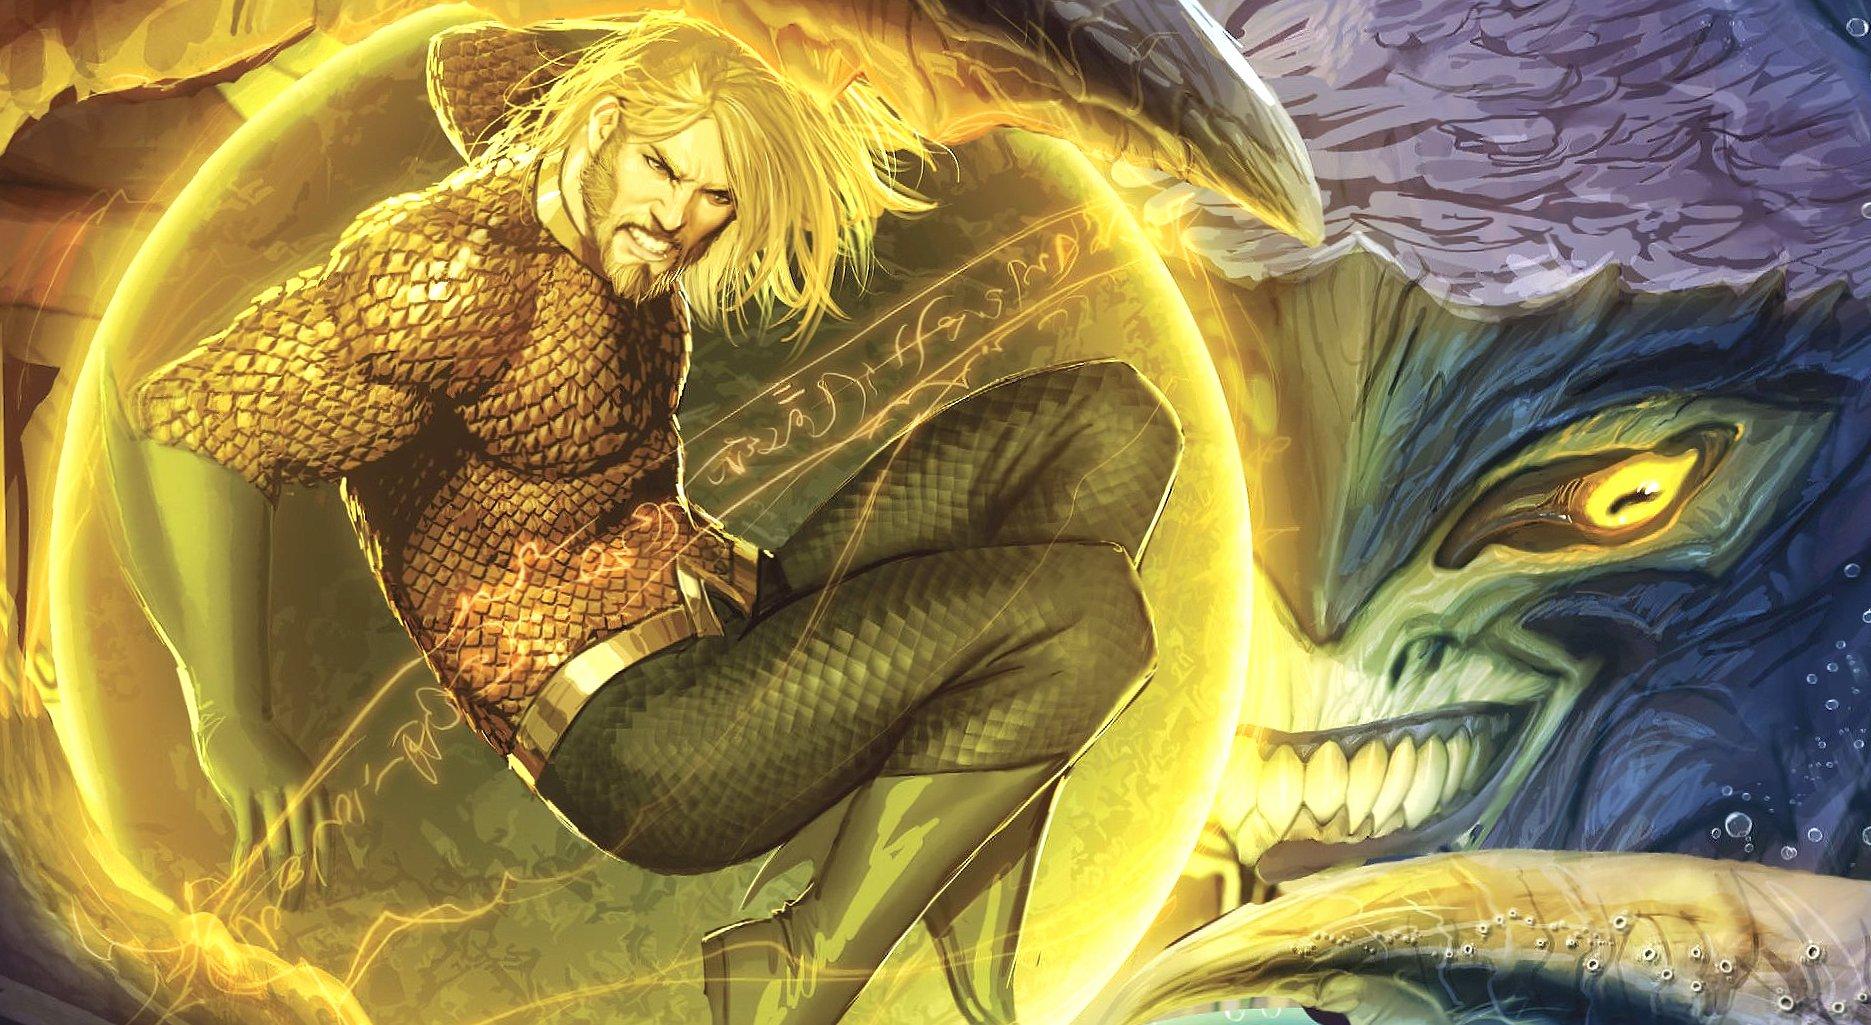 Aquaman wallpapers HD quality